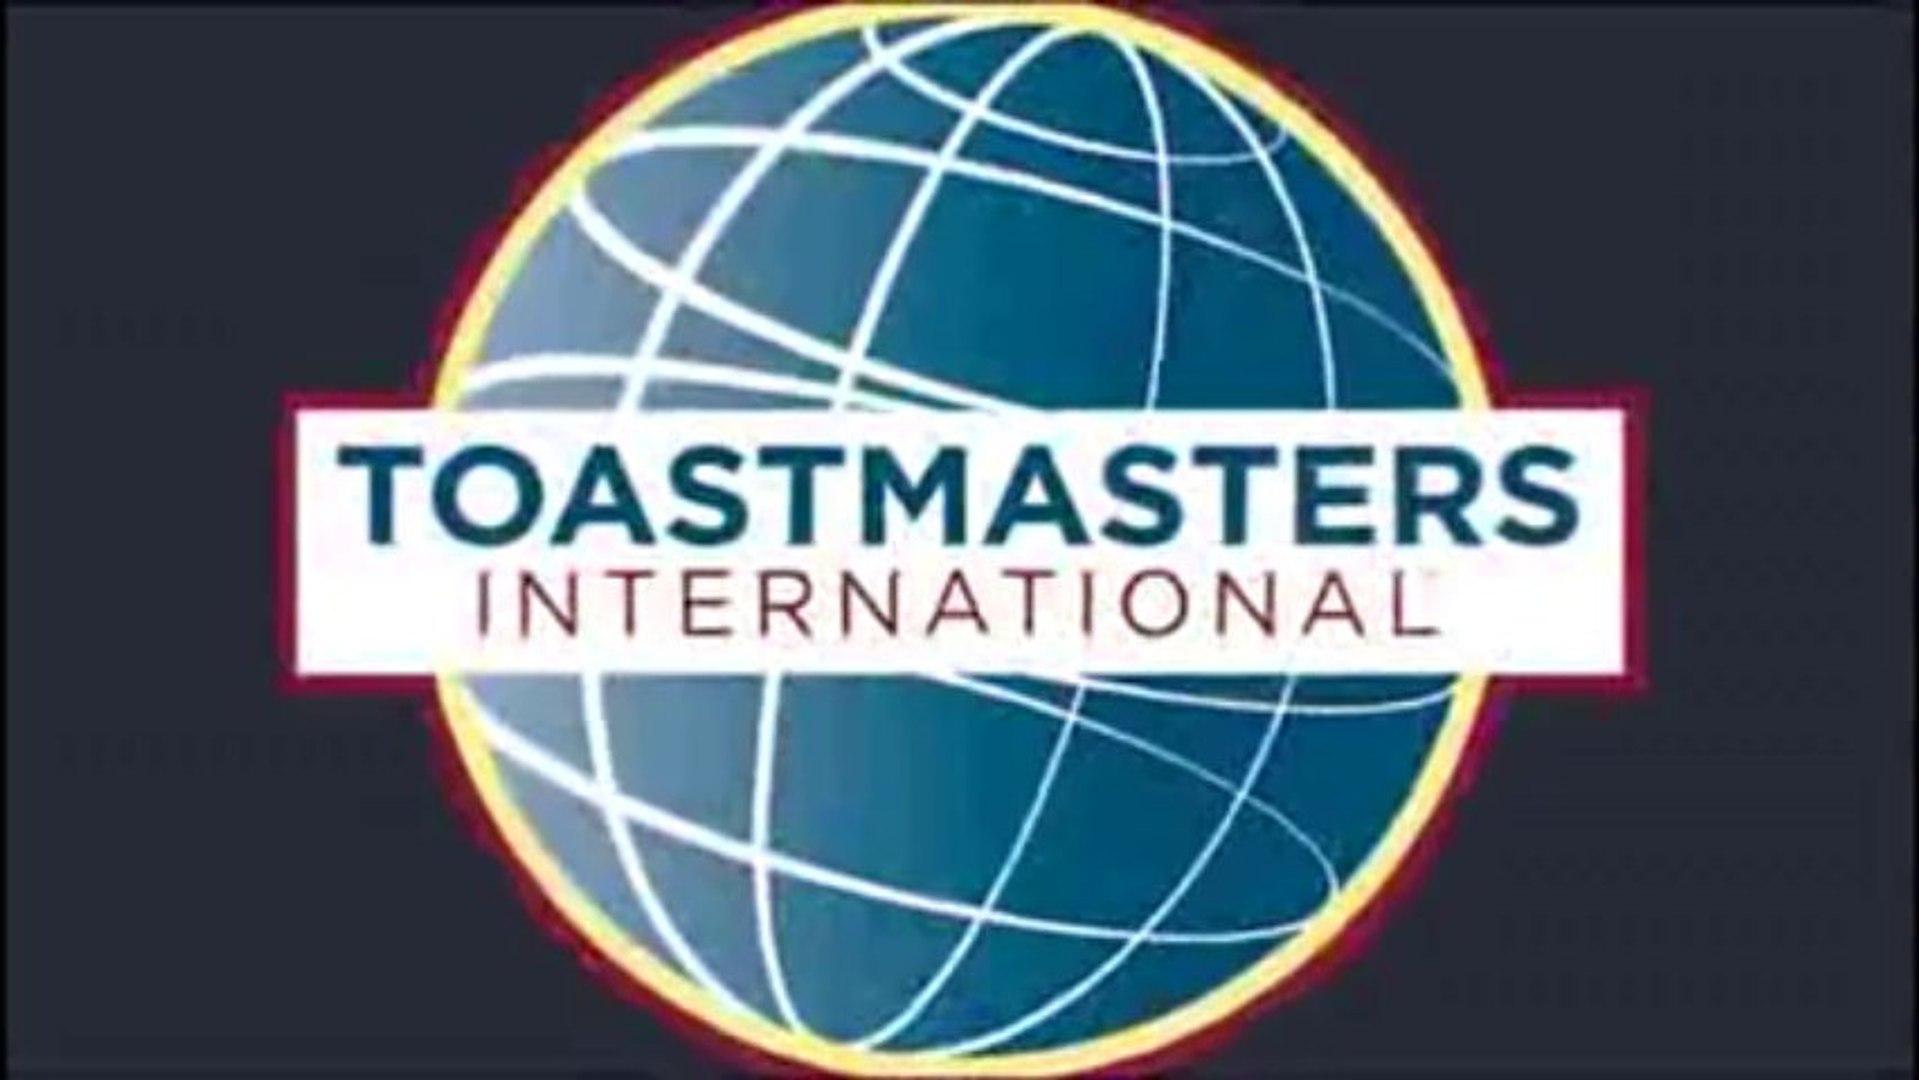 Job Interviews - ToastMasters